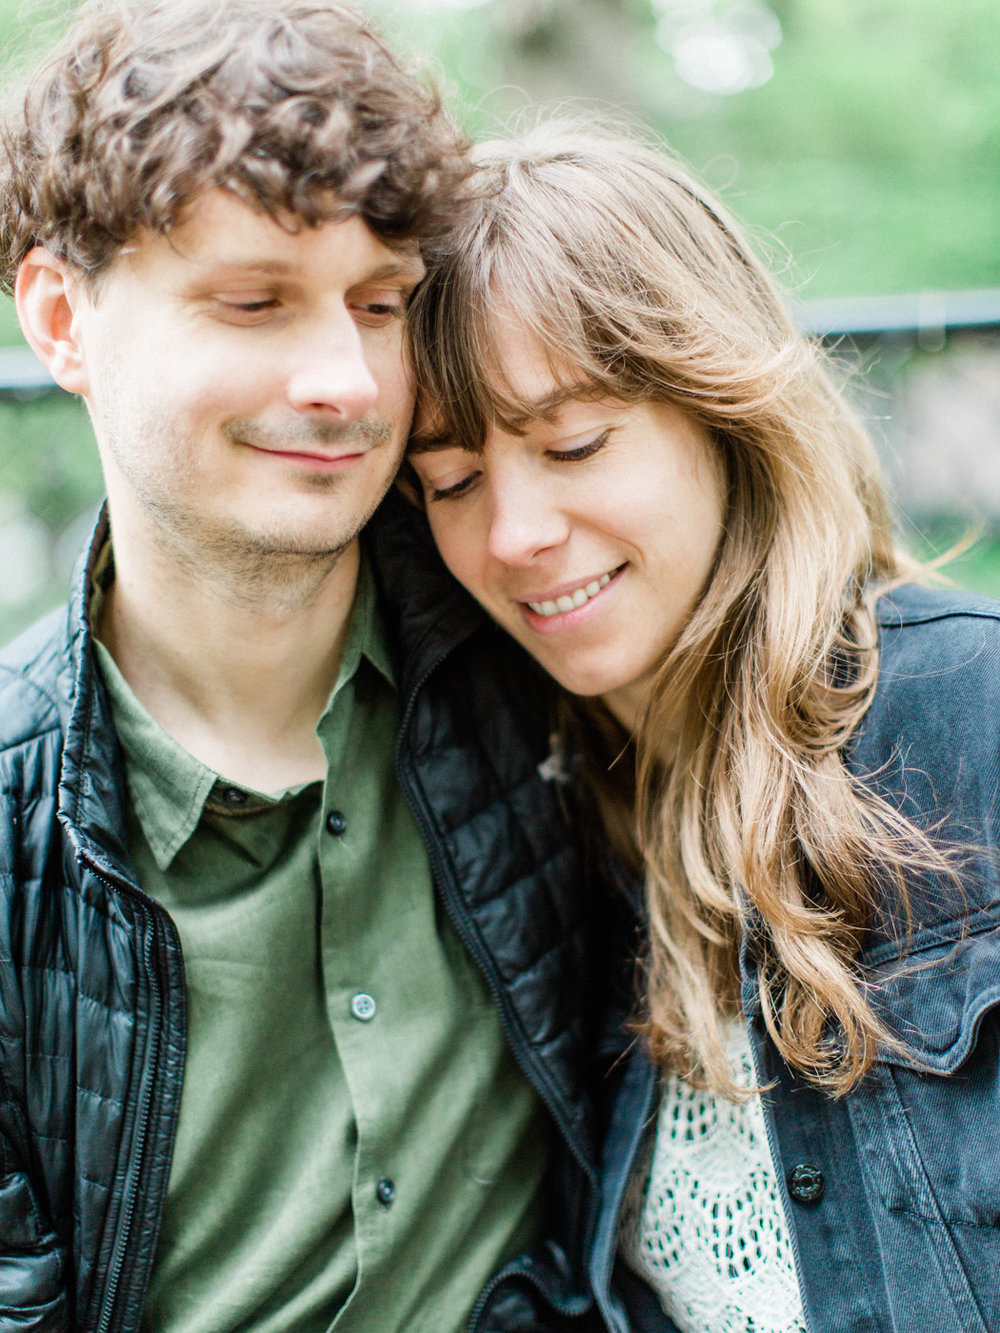 toronto-wedding-photographer-fine-art-documentary-new-york-east-end-engagement-17.jpg